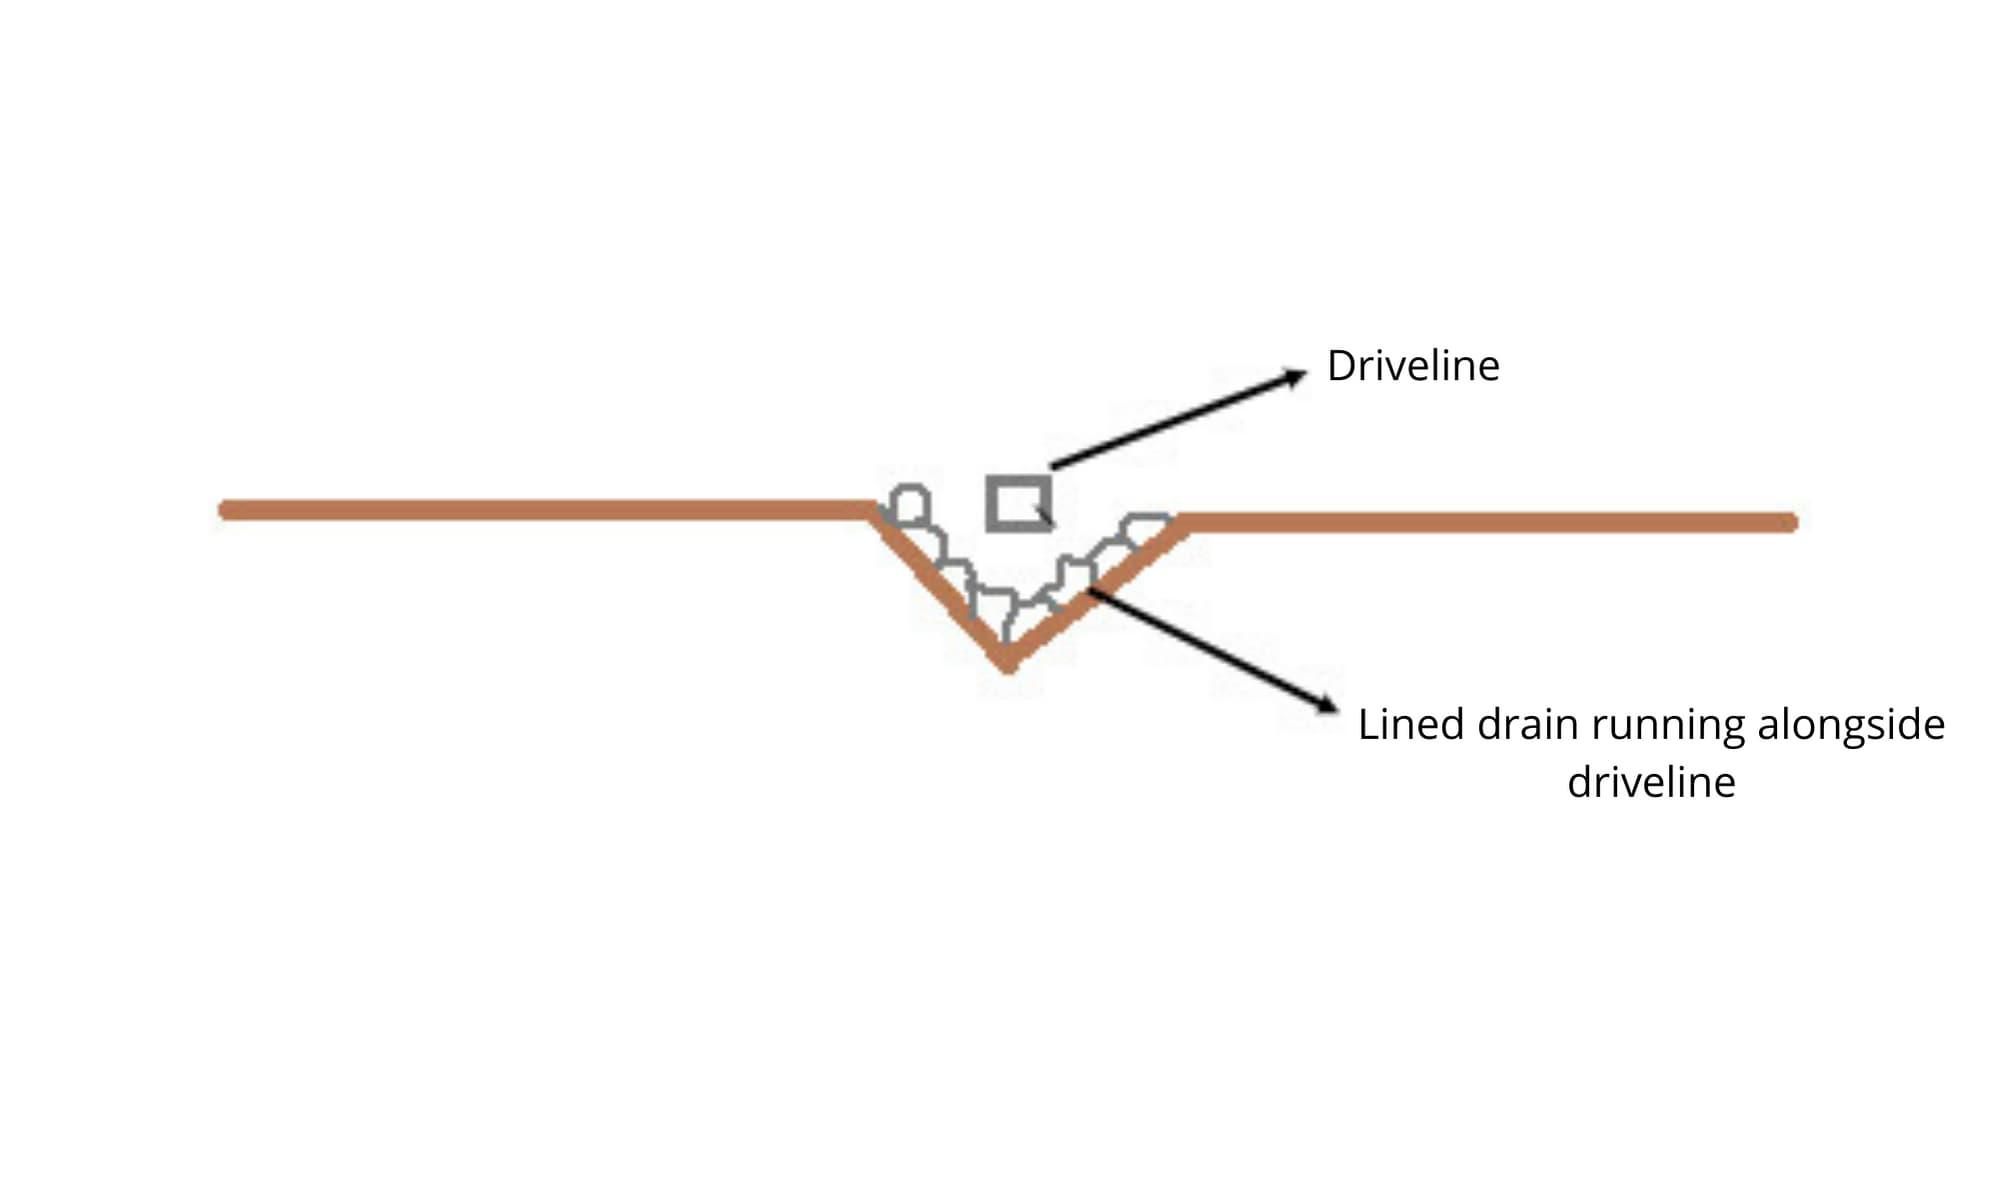 driveline problems